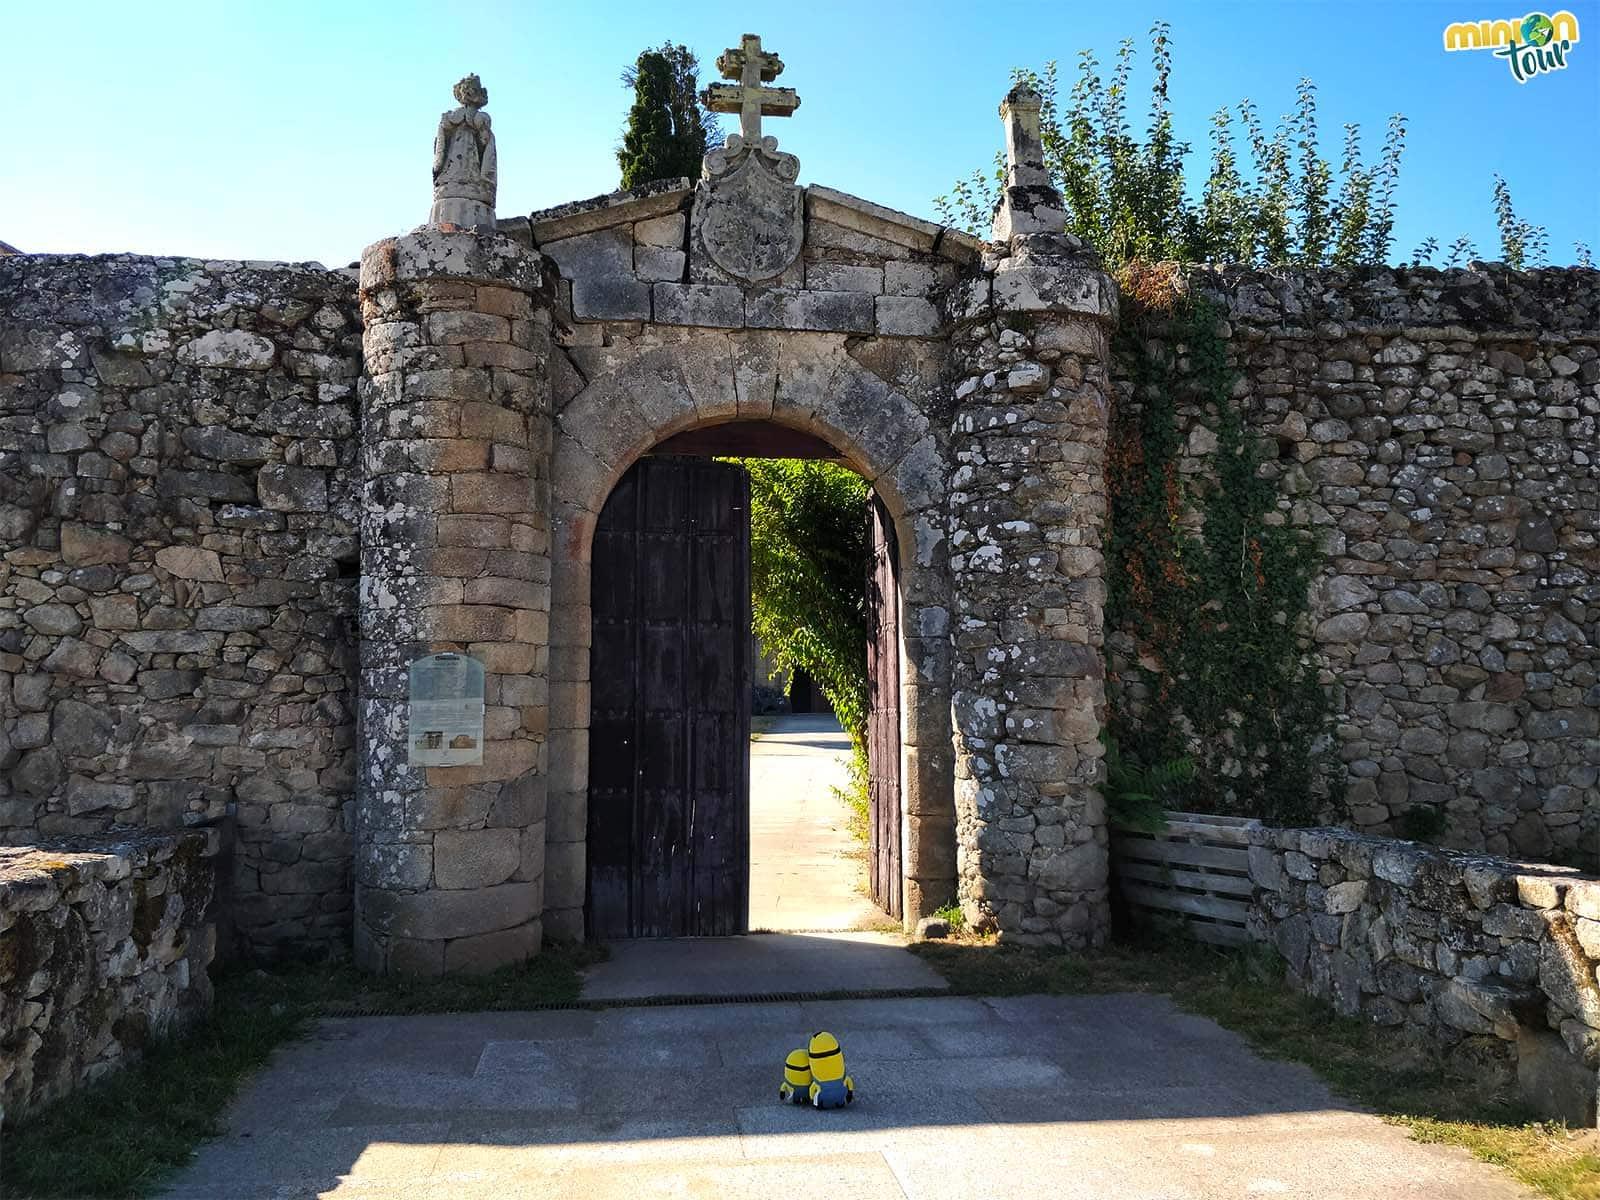 Monasterio das Nais Bernardas, primera parada en nuestra ruta del Románico de la Ribeira Sacra